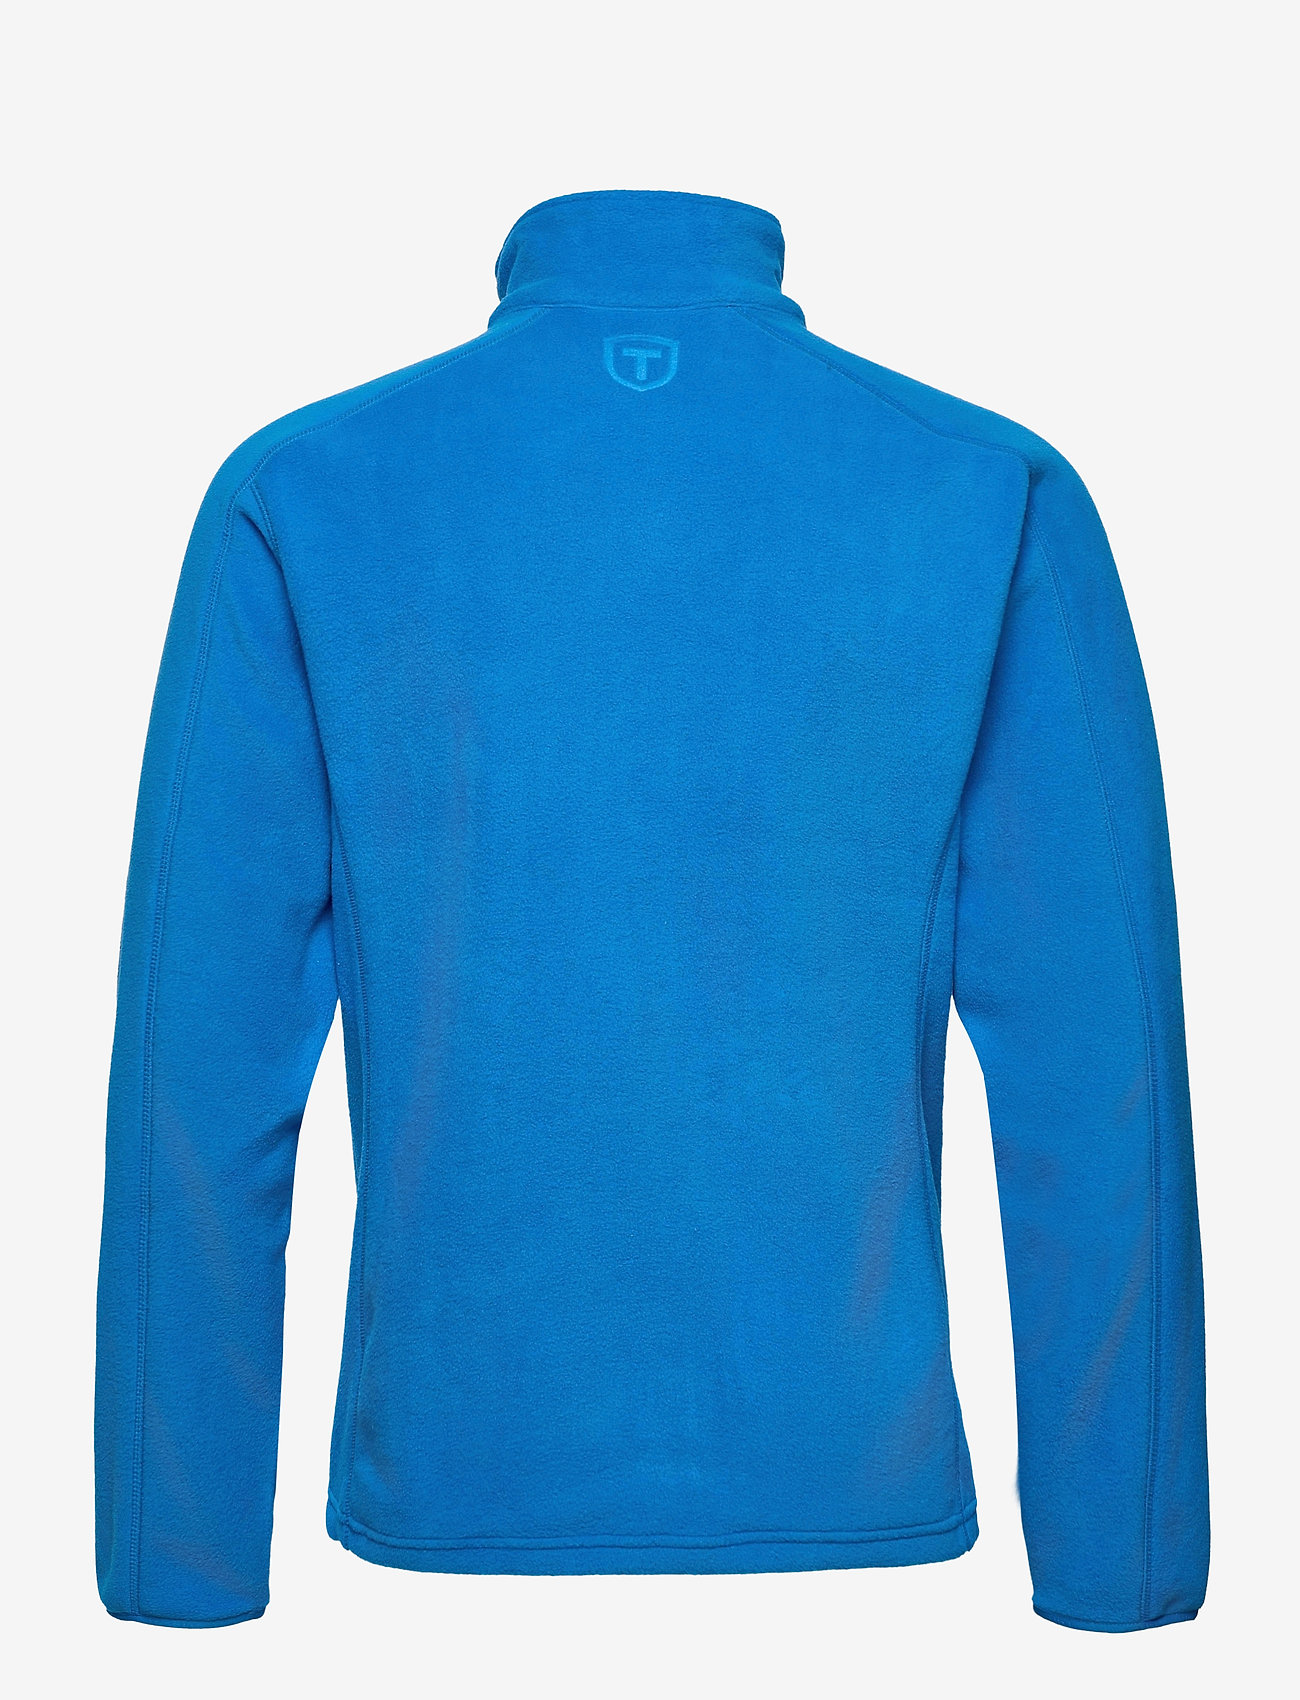 Tenson - Miracle M - basic sweatshirts - blue - 1